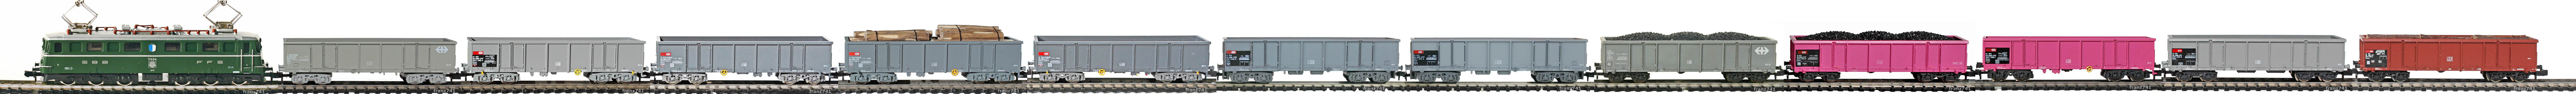 Epoche-IV-SBB-Eaos-Gueterzug_Ae-6-6-Elok-Eaos-Eanos-Hochbordwagen